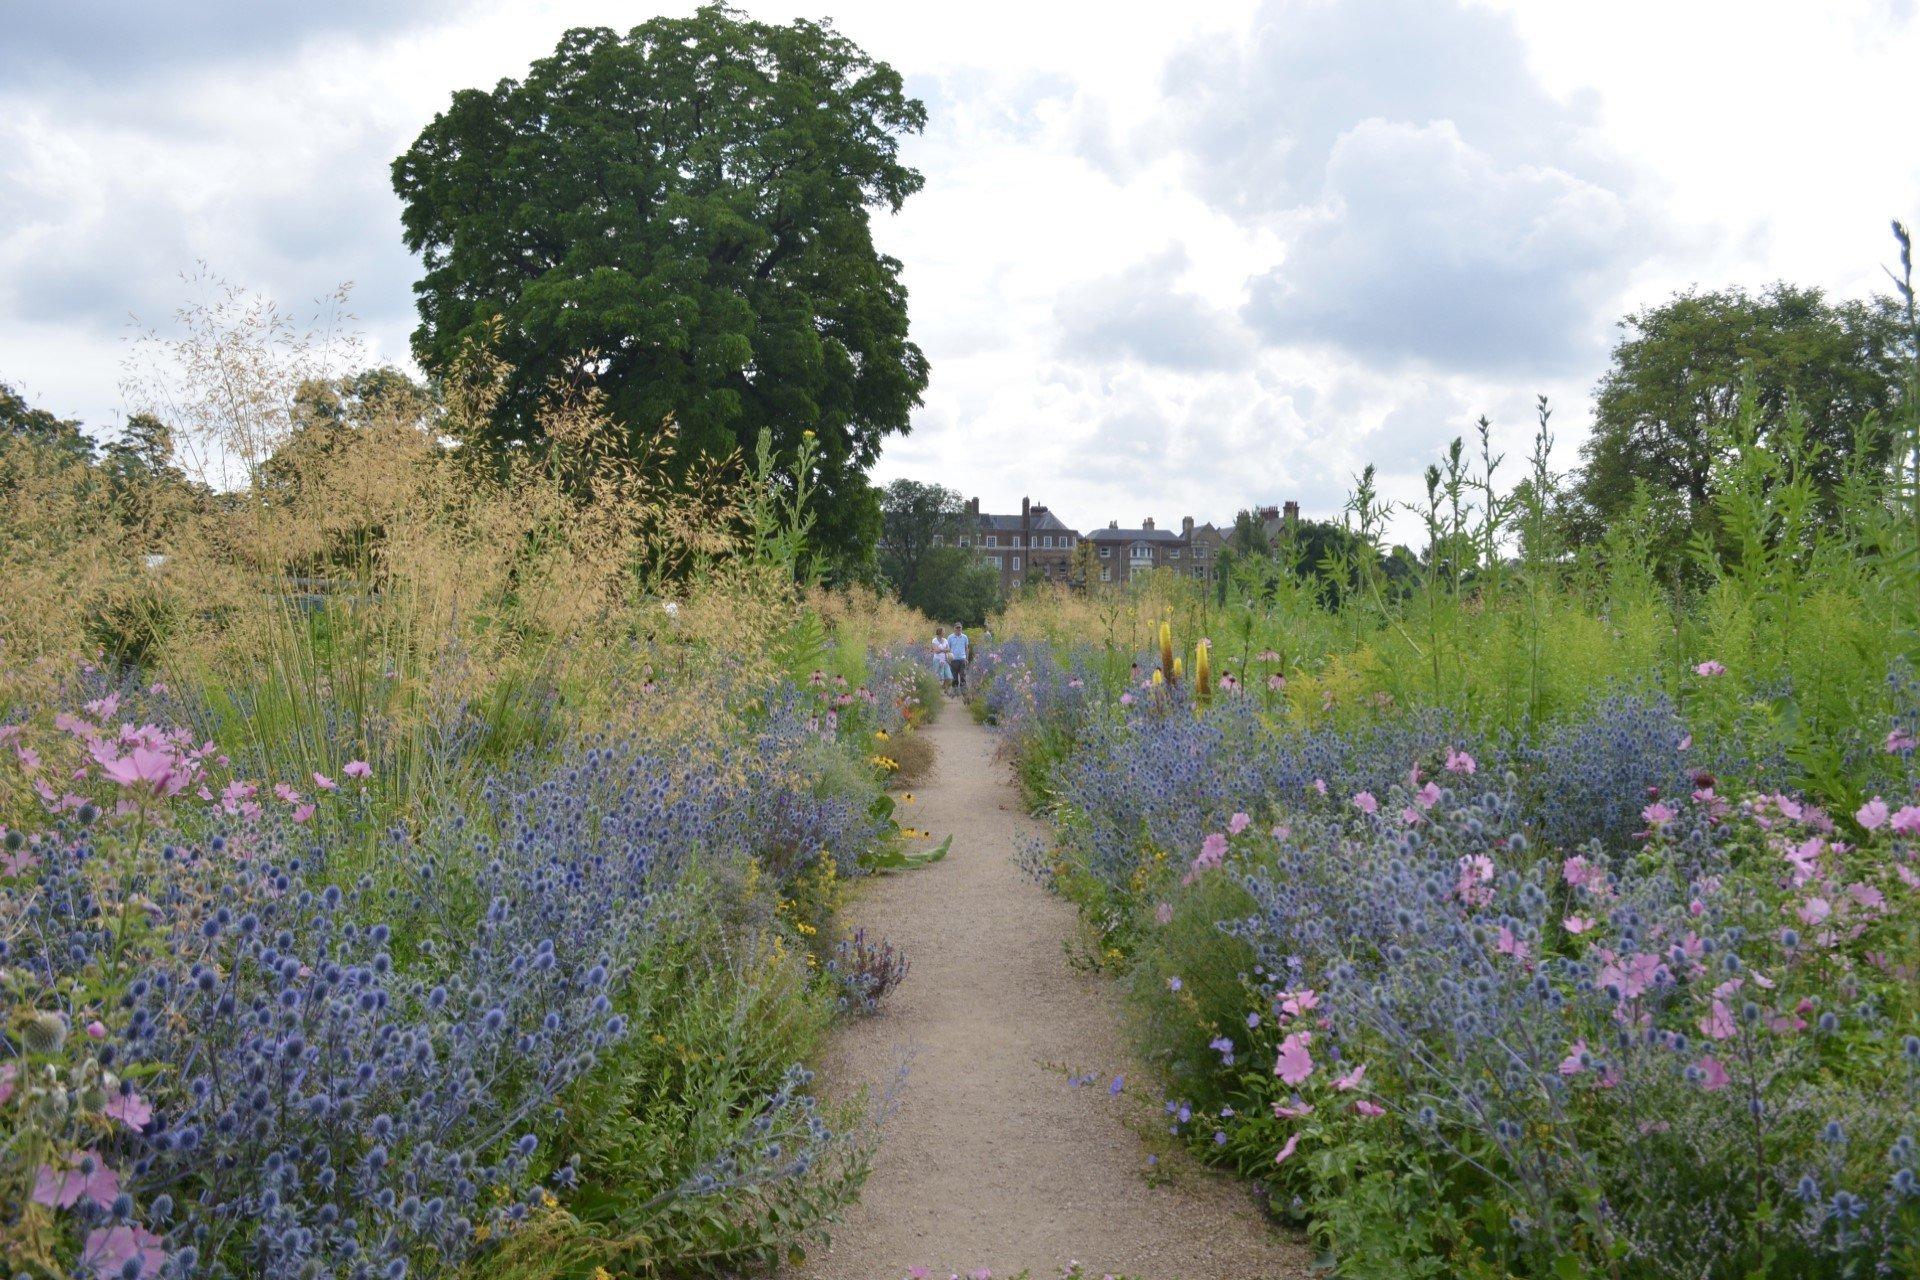 Oxford Botanic Garden - The Lower Garden